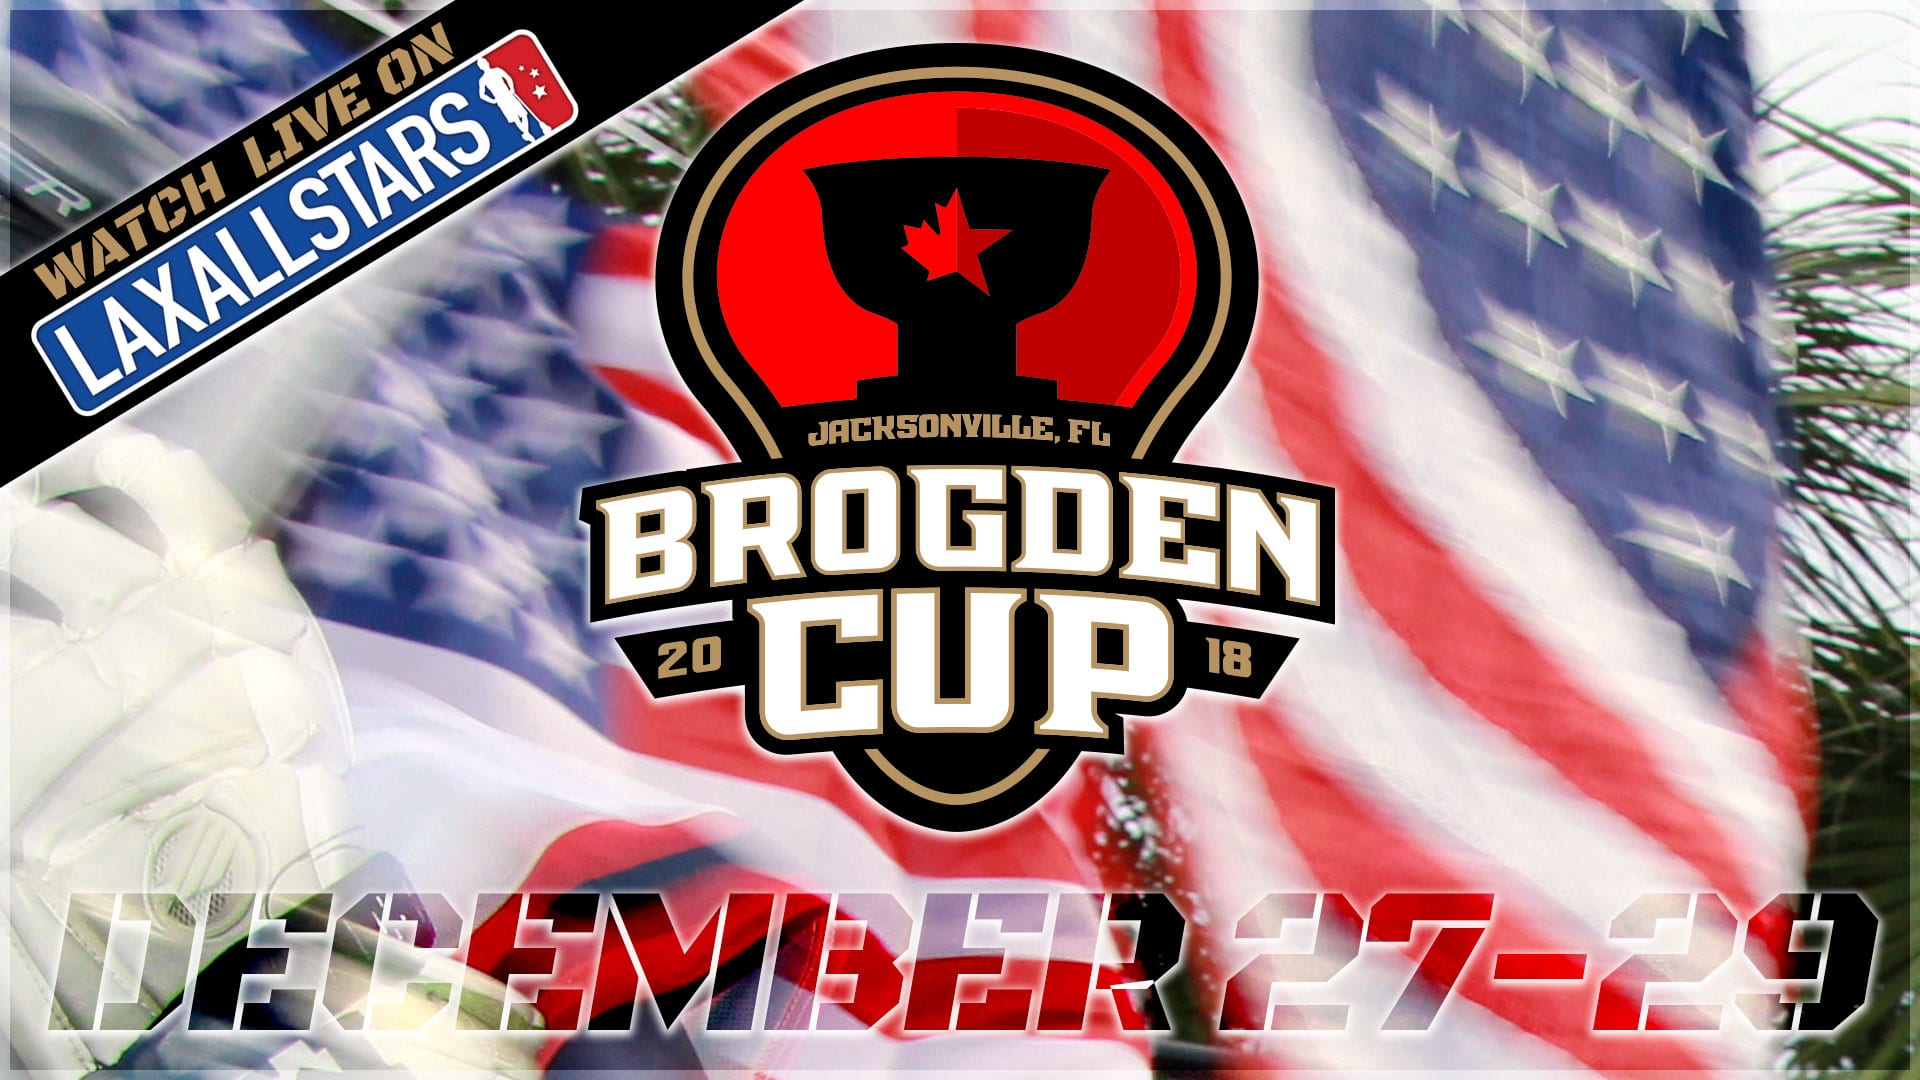 Watch USA vs OntarIo - 2018 Brogden Cup